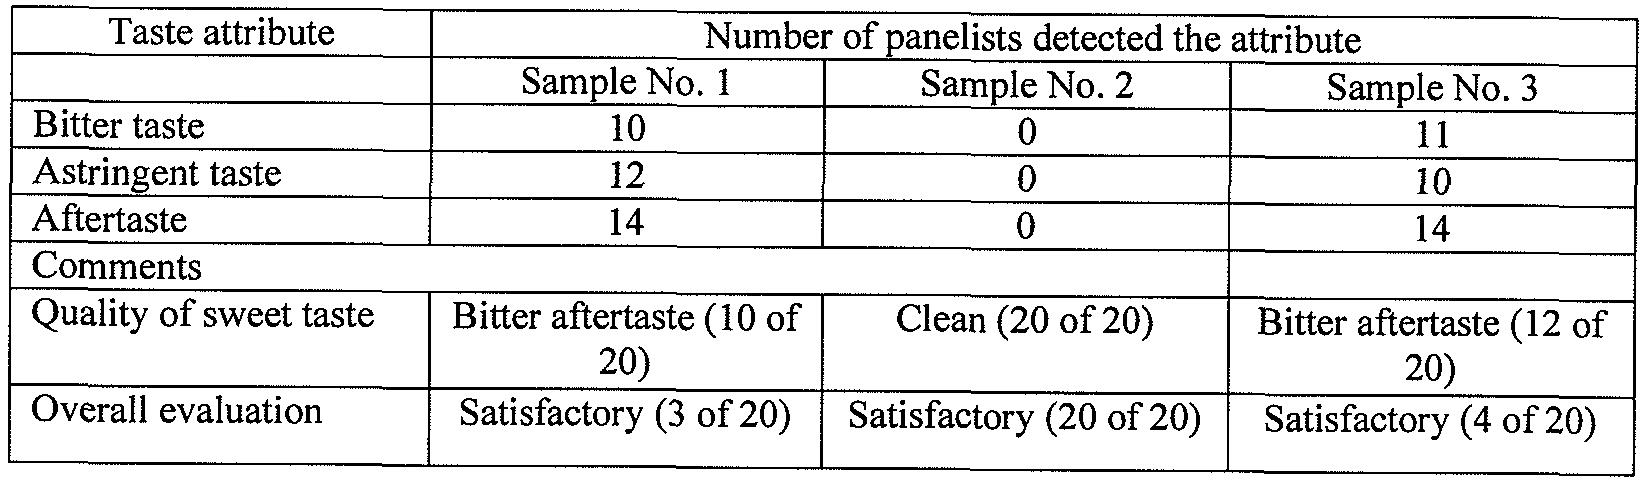 sensory evaluation of chesa fruit cookies Abstractchemical and sensory evaluation of peanut butter microbial examination of spoilt avocado fruit production and quality evaluation of cookies from.